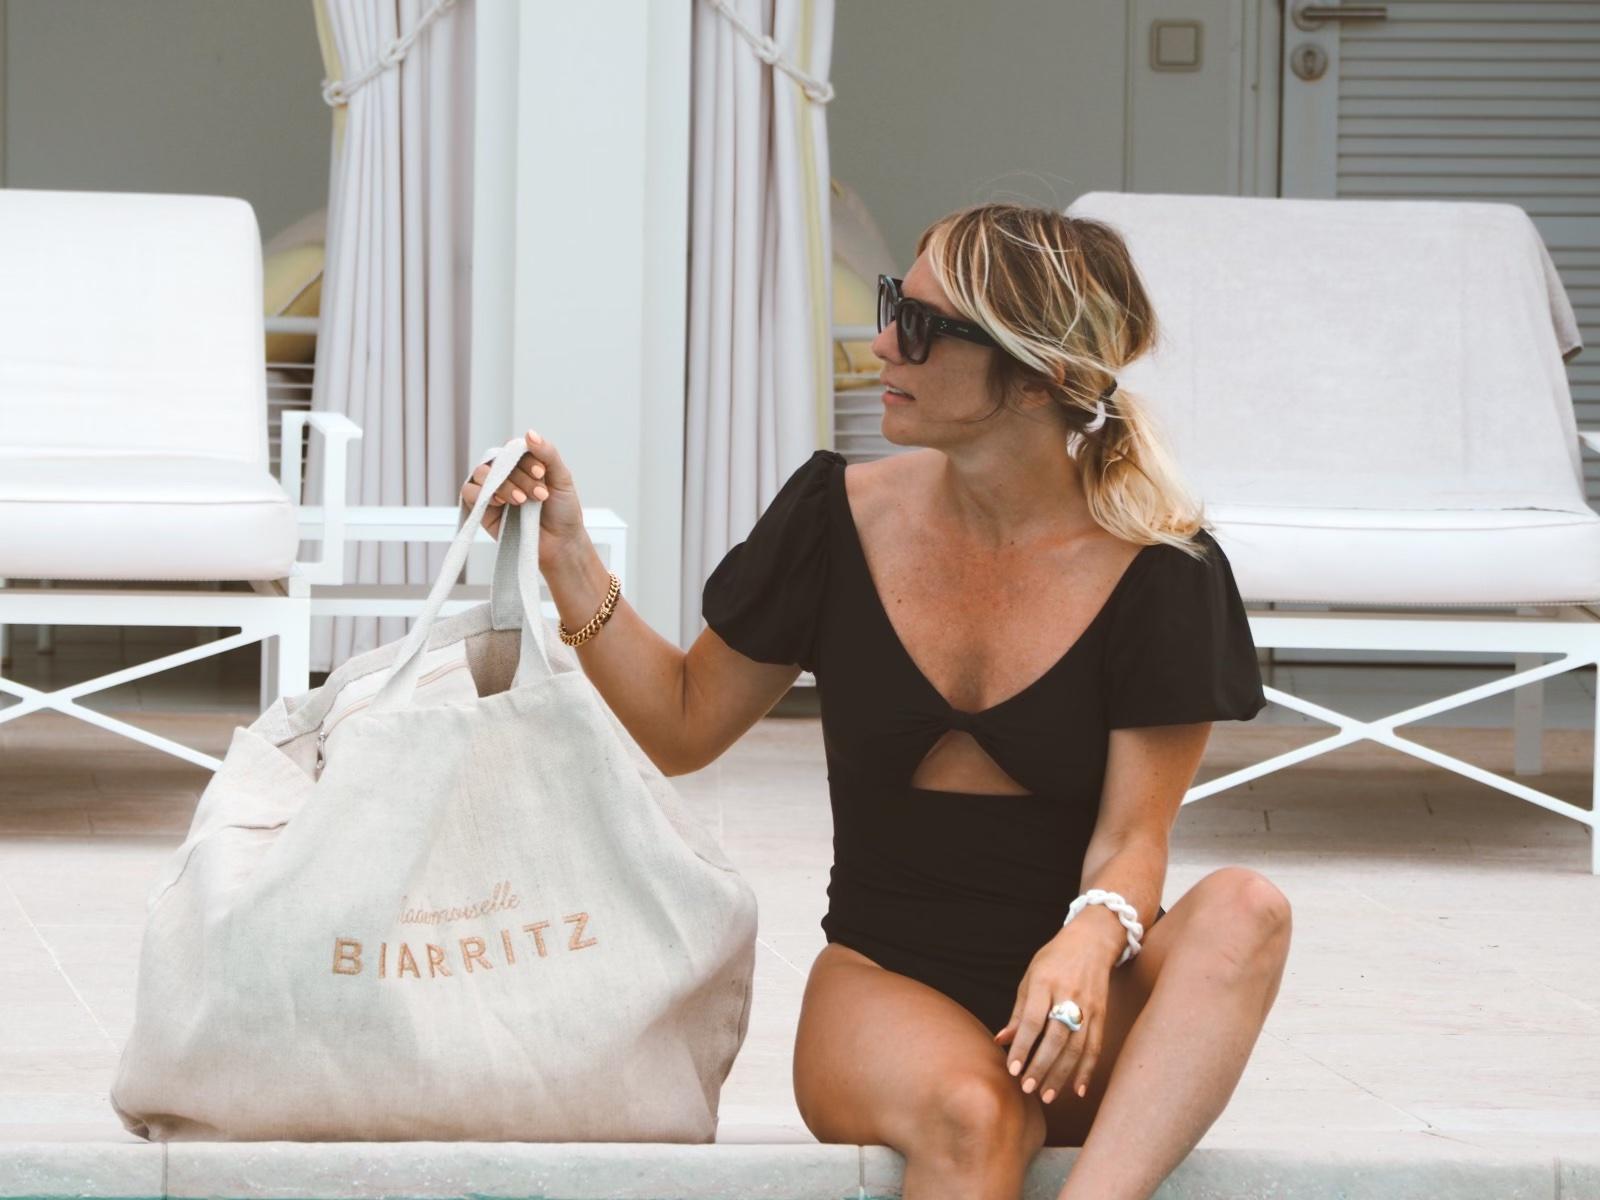 Le Summer Bag